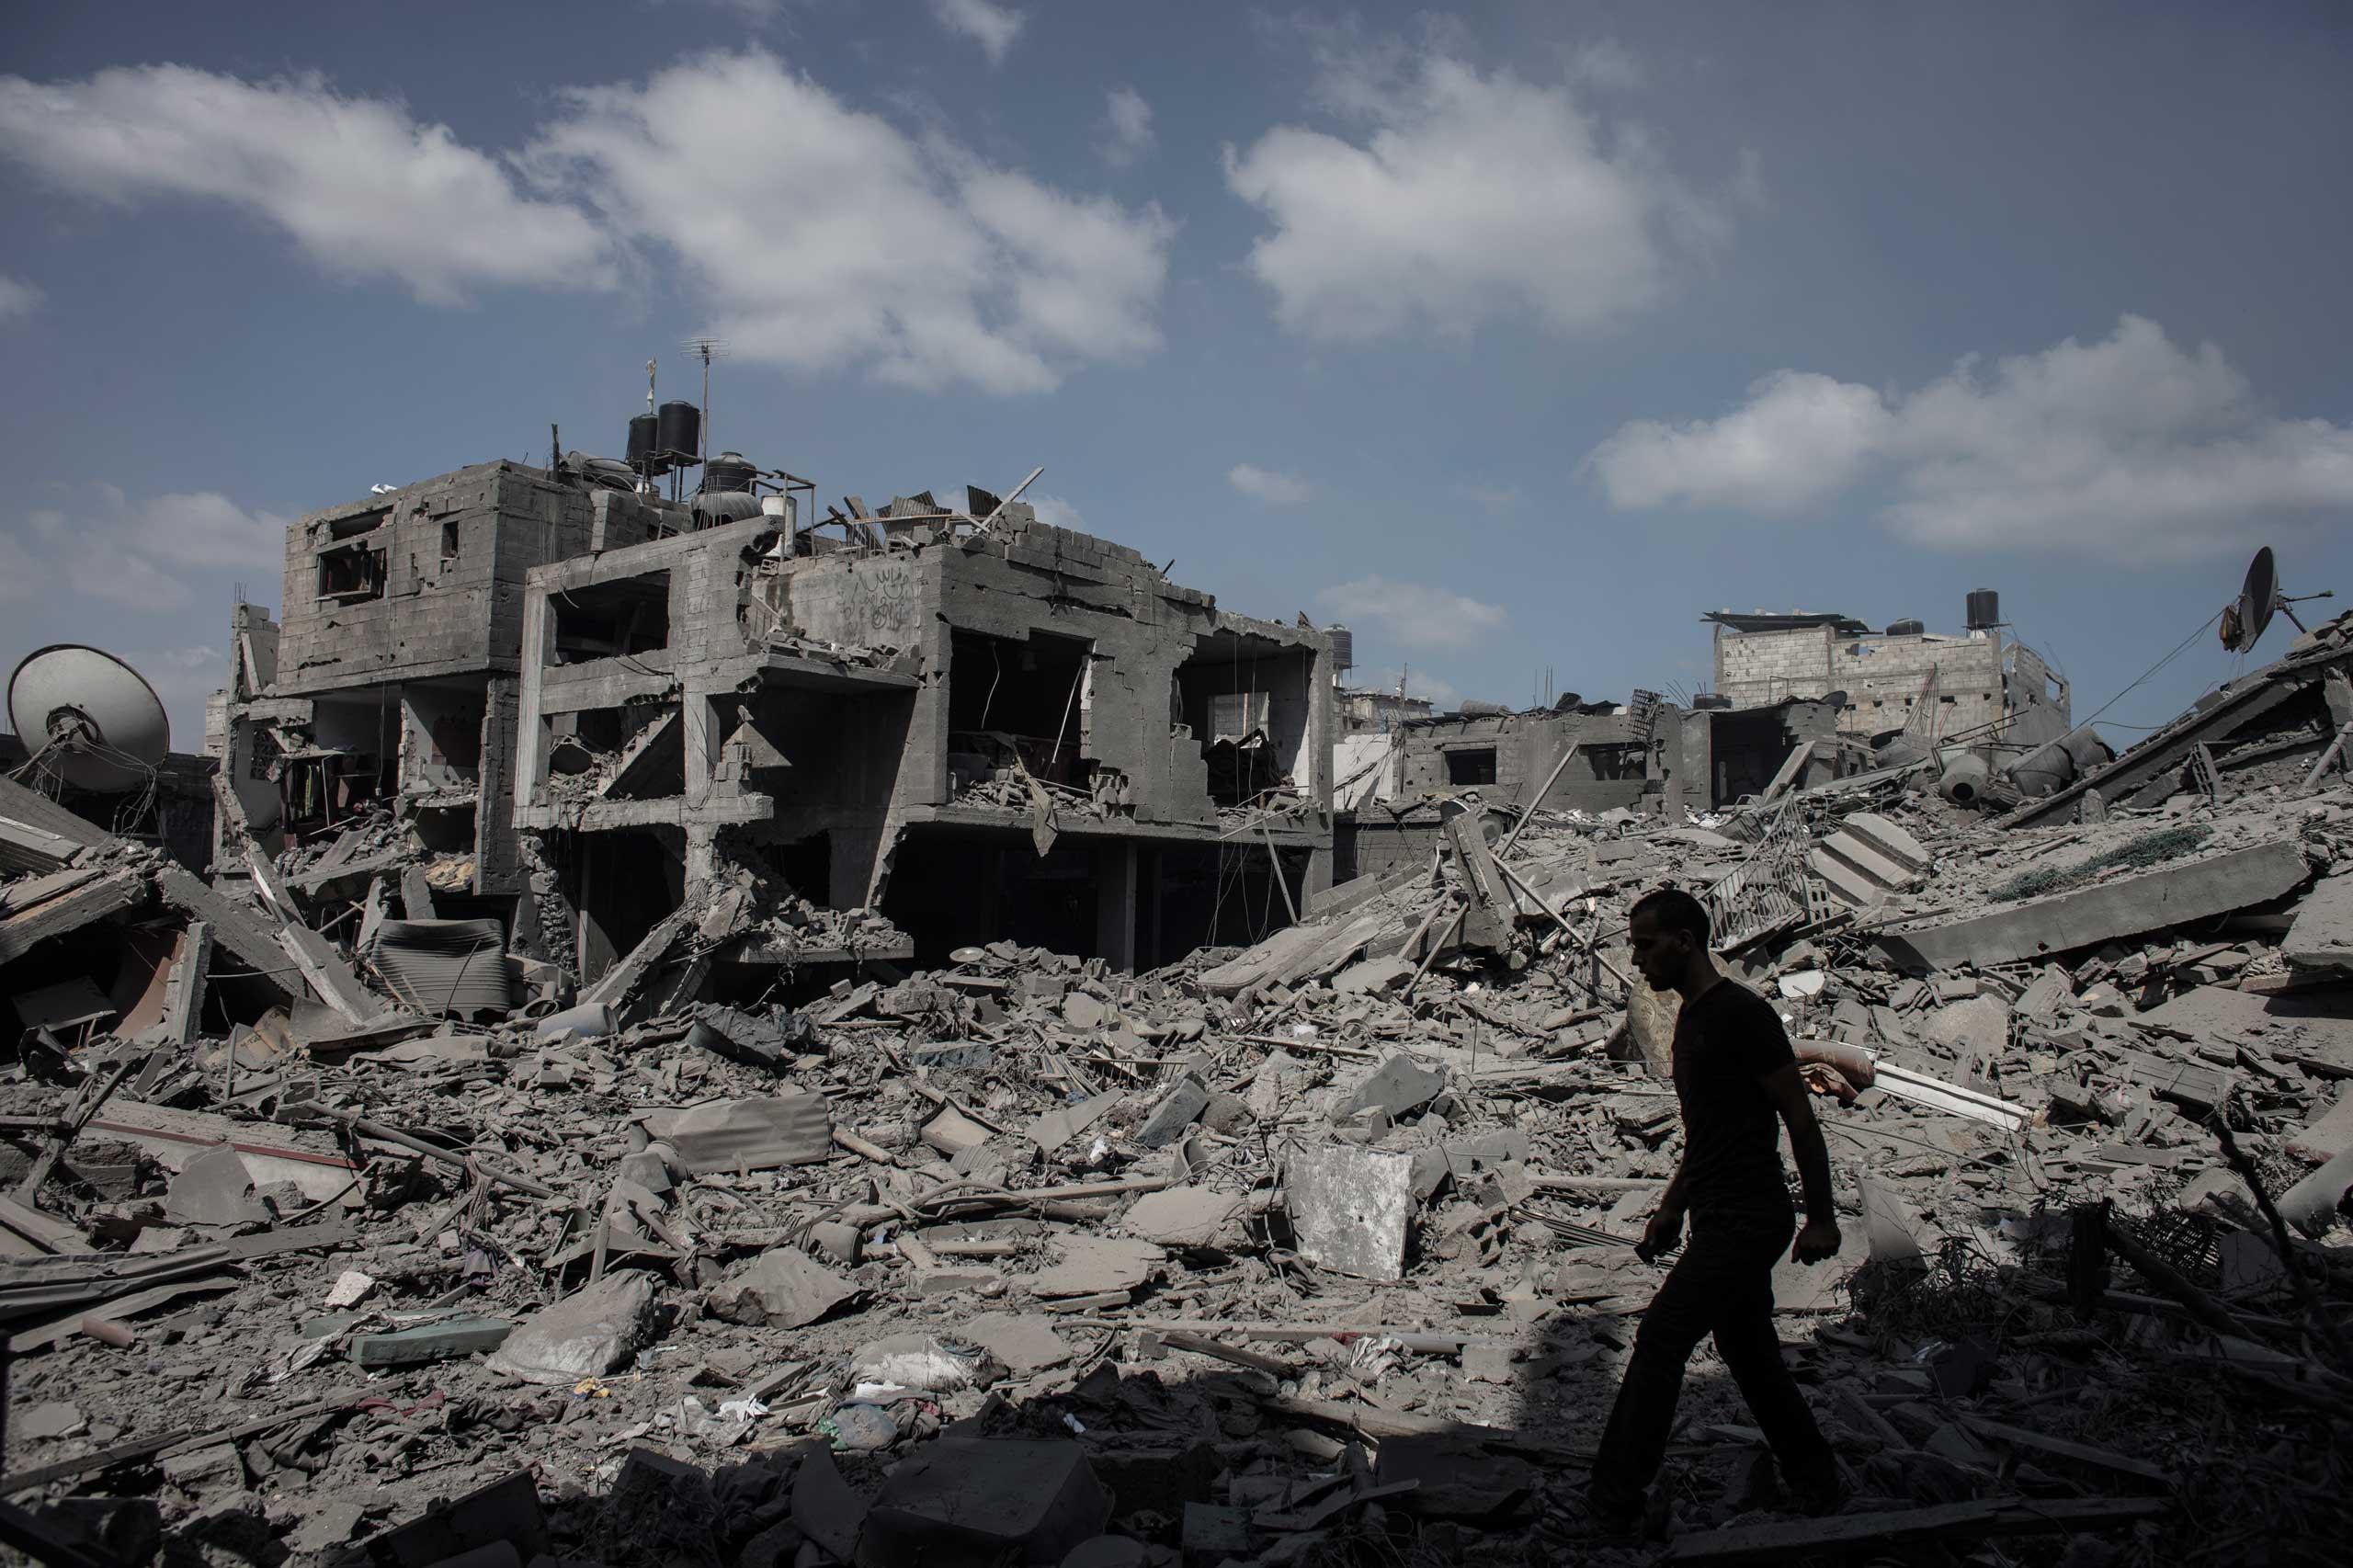 A Palestinian man walks past destroyed houses in Beit Hanoun, northern Gaza Strip, July 16, 2014.